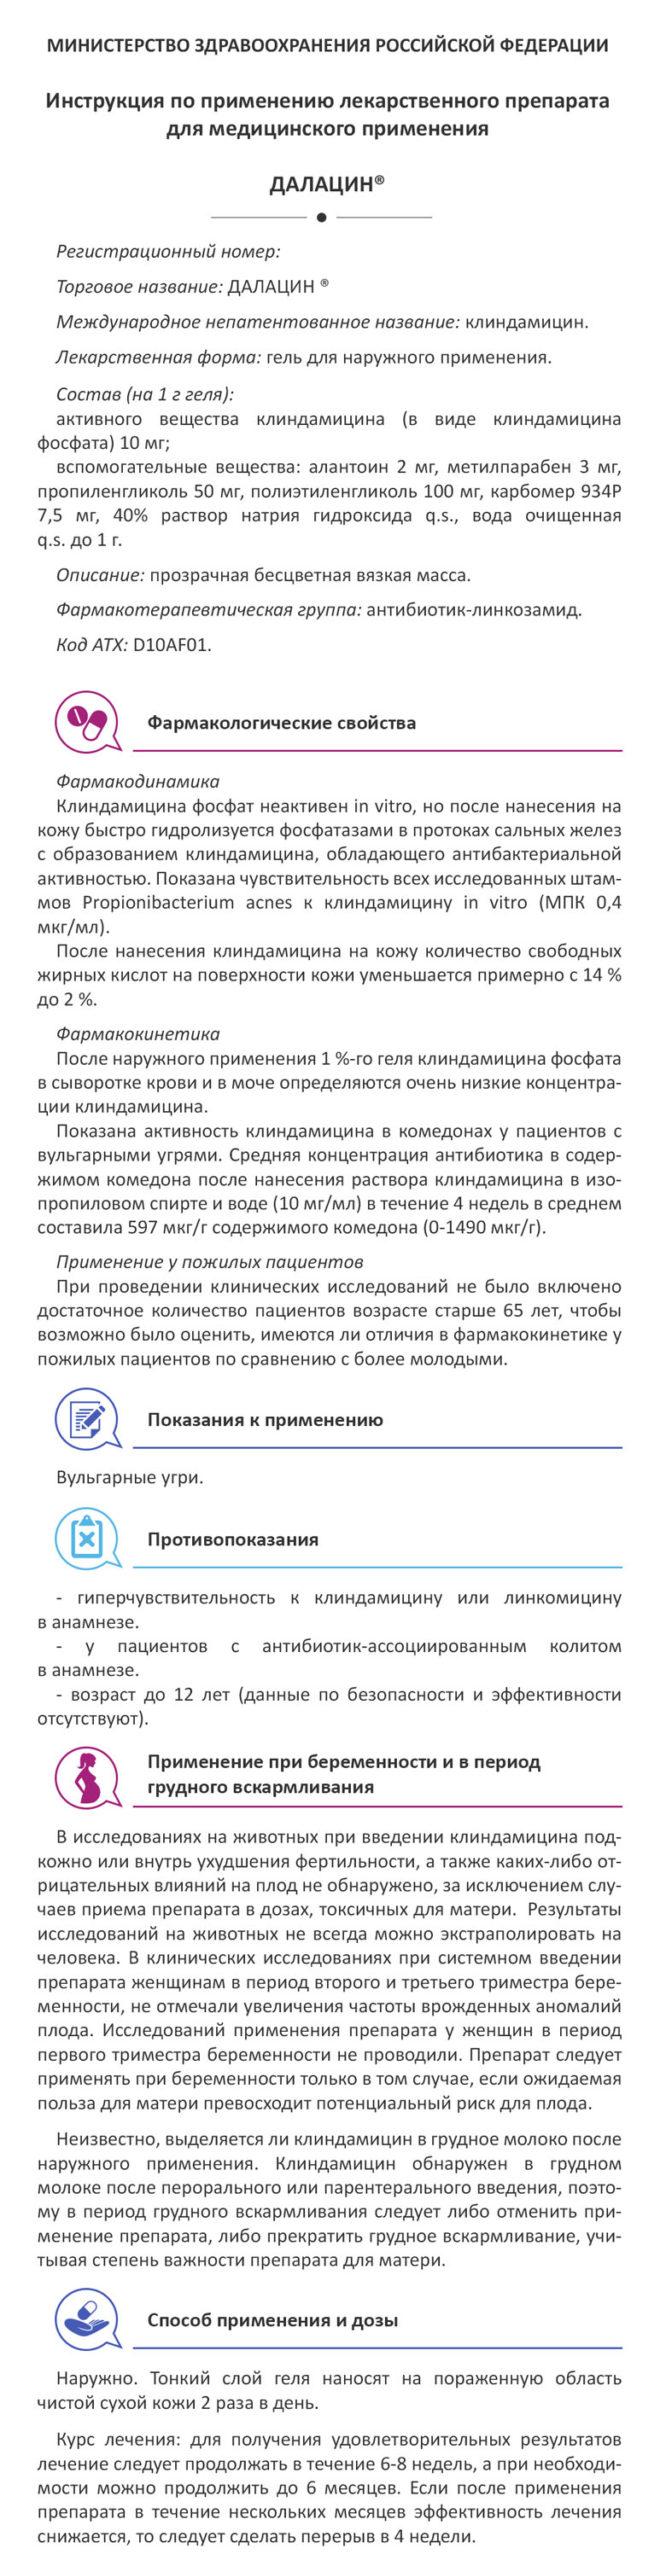 0-инструкция далацин